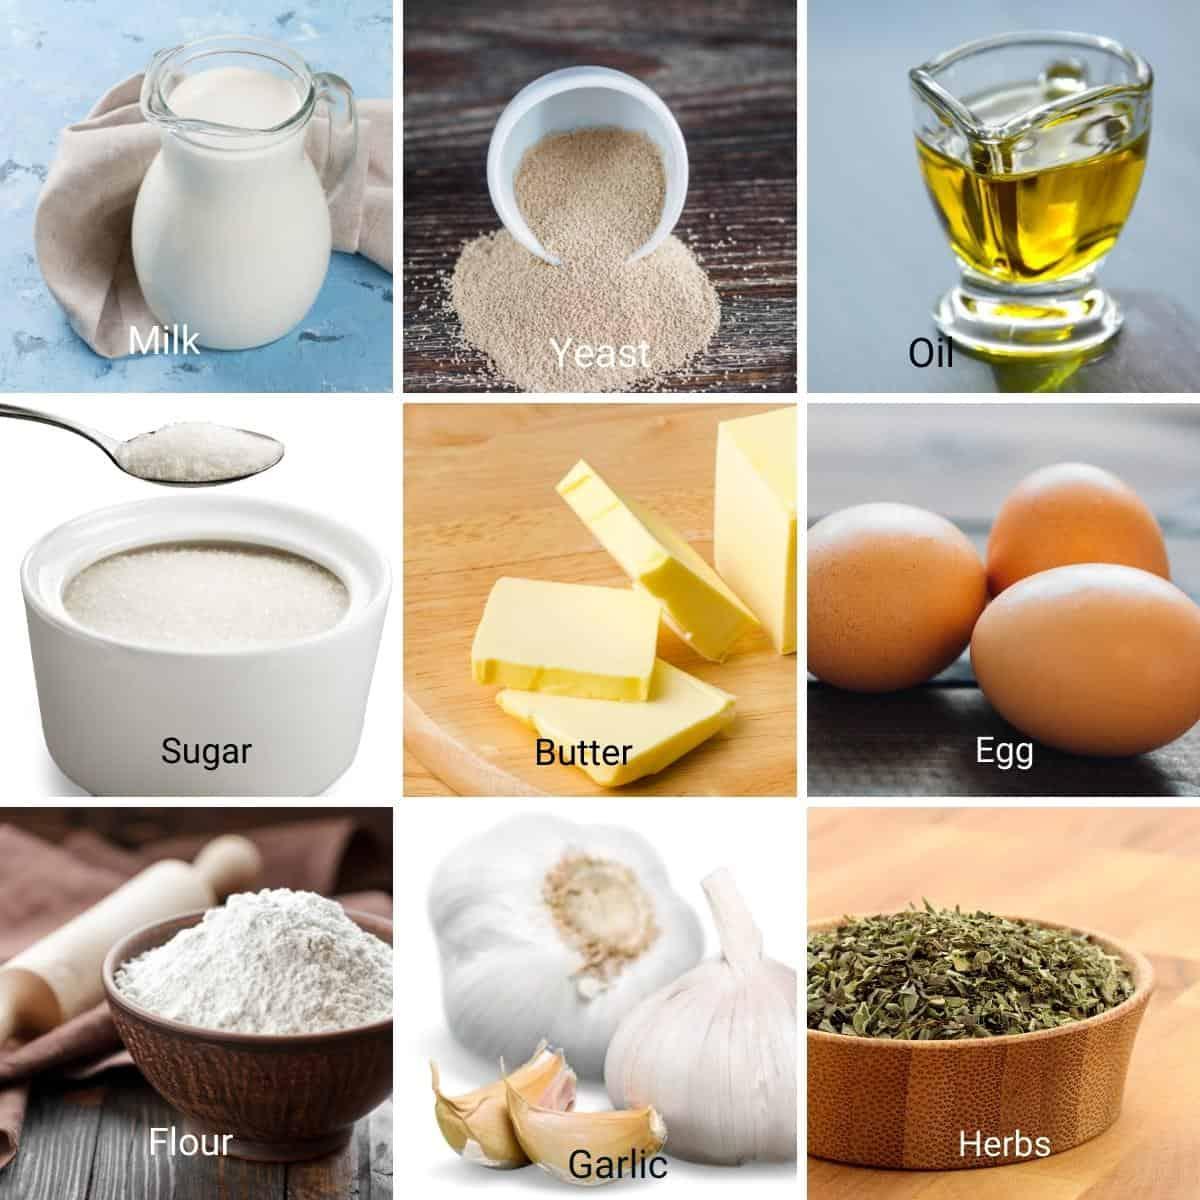 Ingredients for garlic butter rolls.